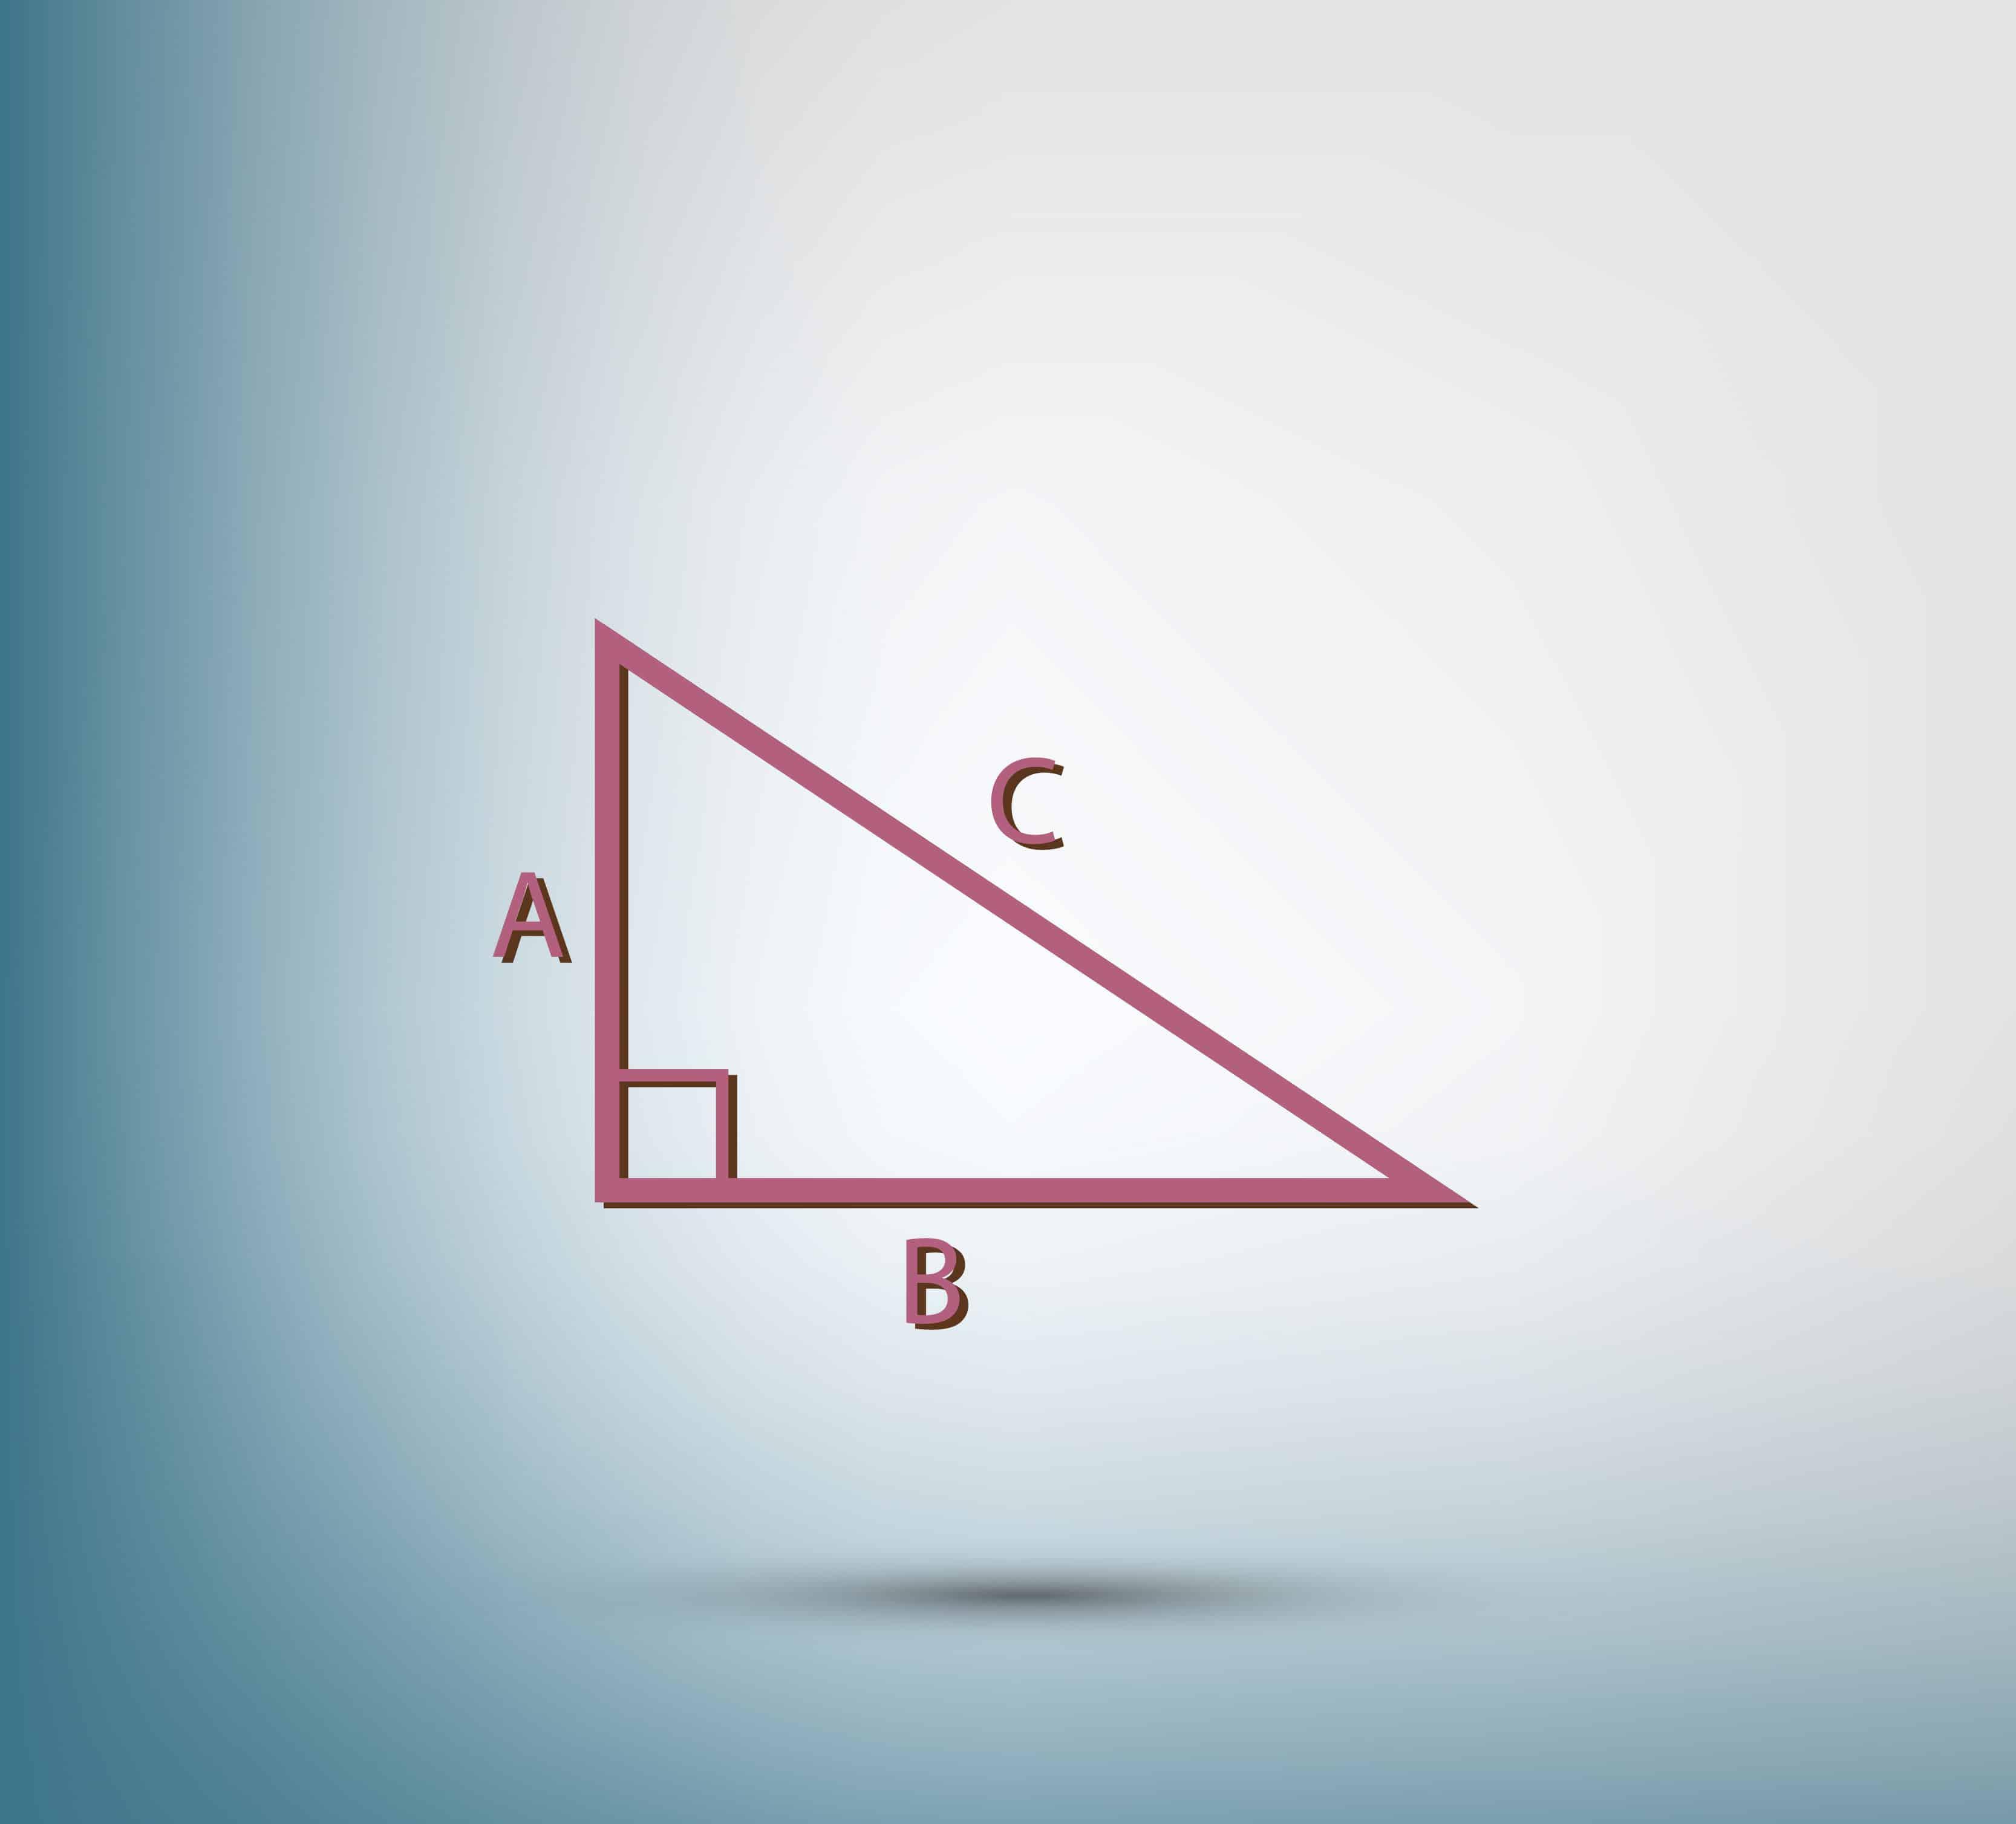 Math Problems Geometry